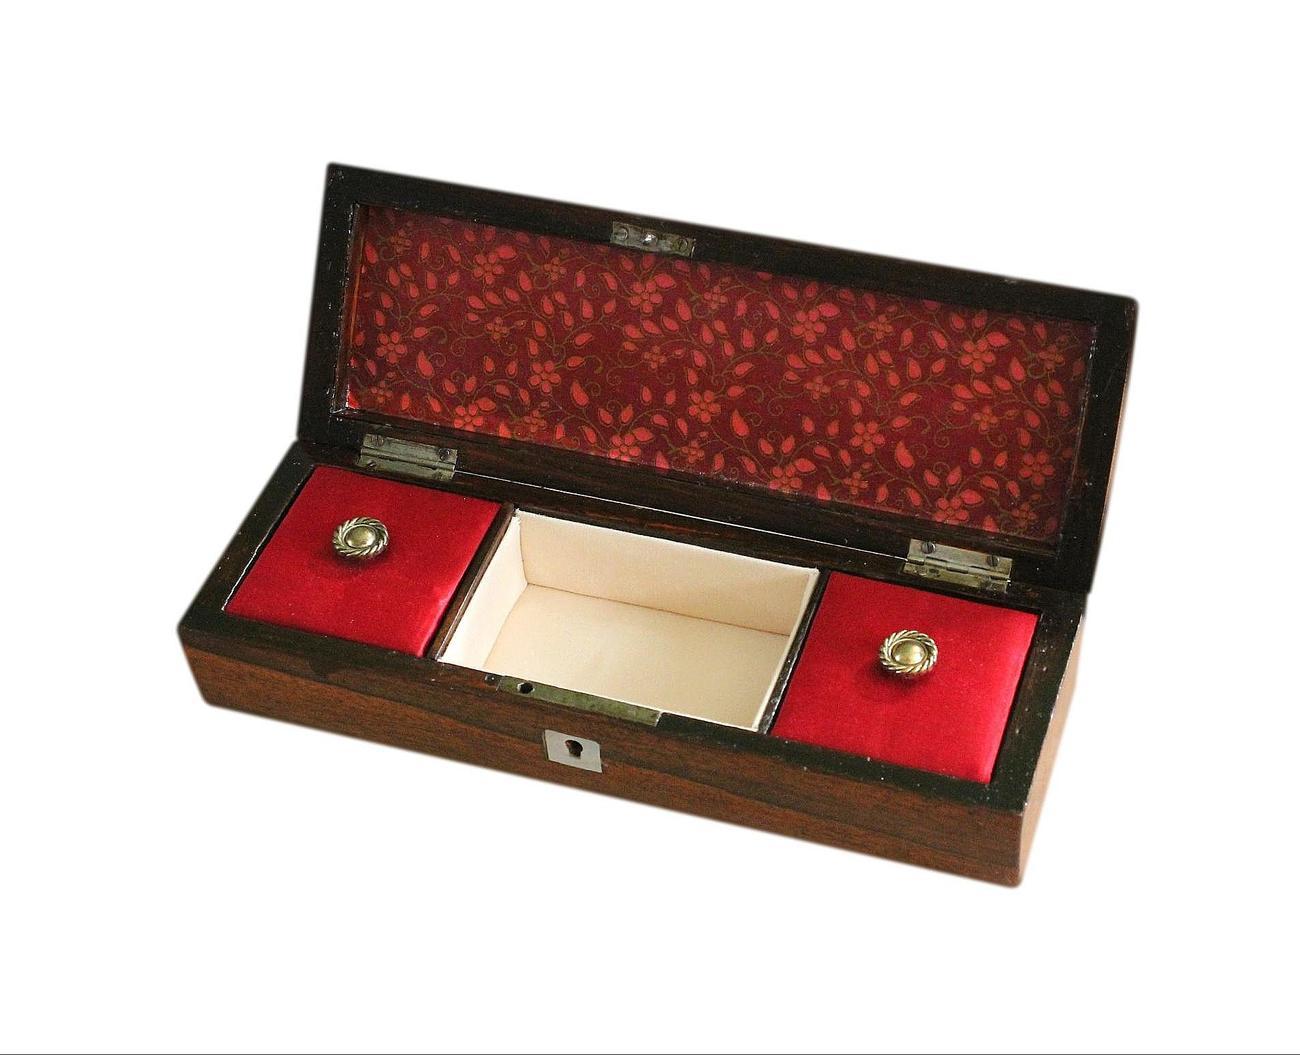 Small_antique_jewellery_box_steel_handle_5.jpg